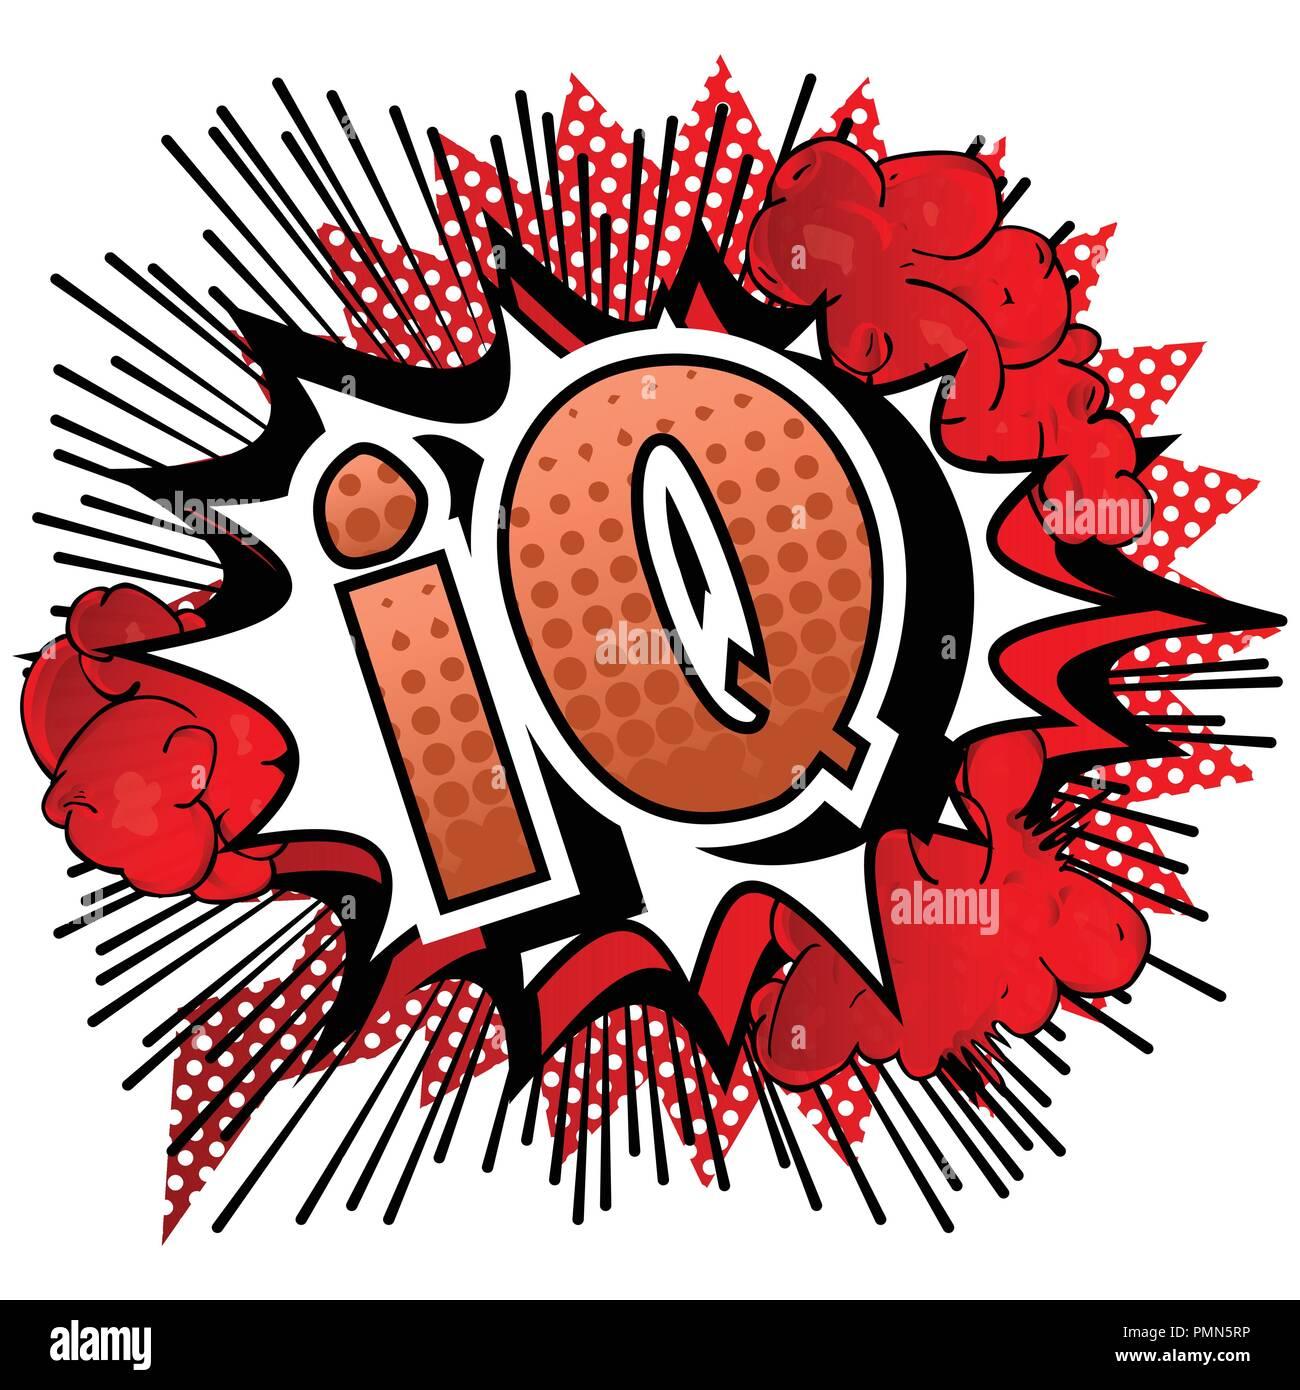 IQ - Vector illustrated comic book style phrase. - Stock Image